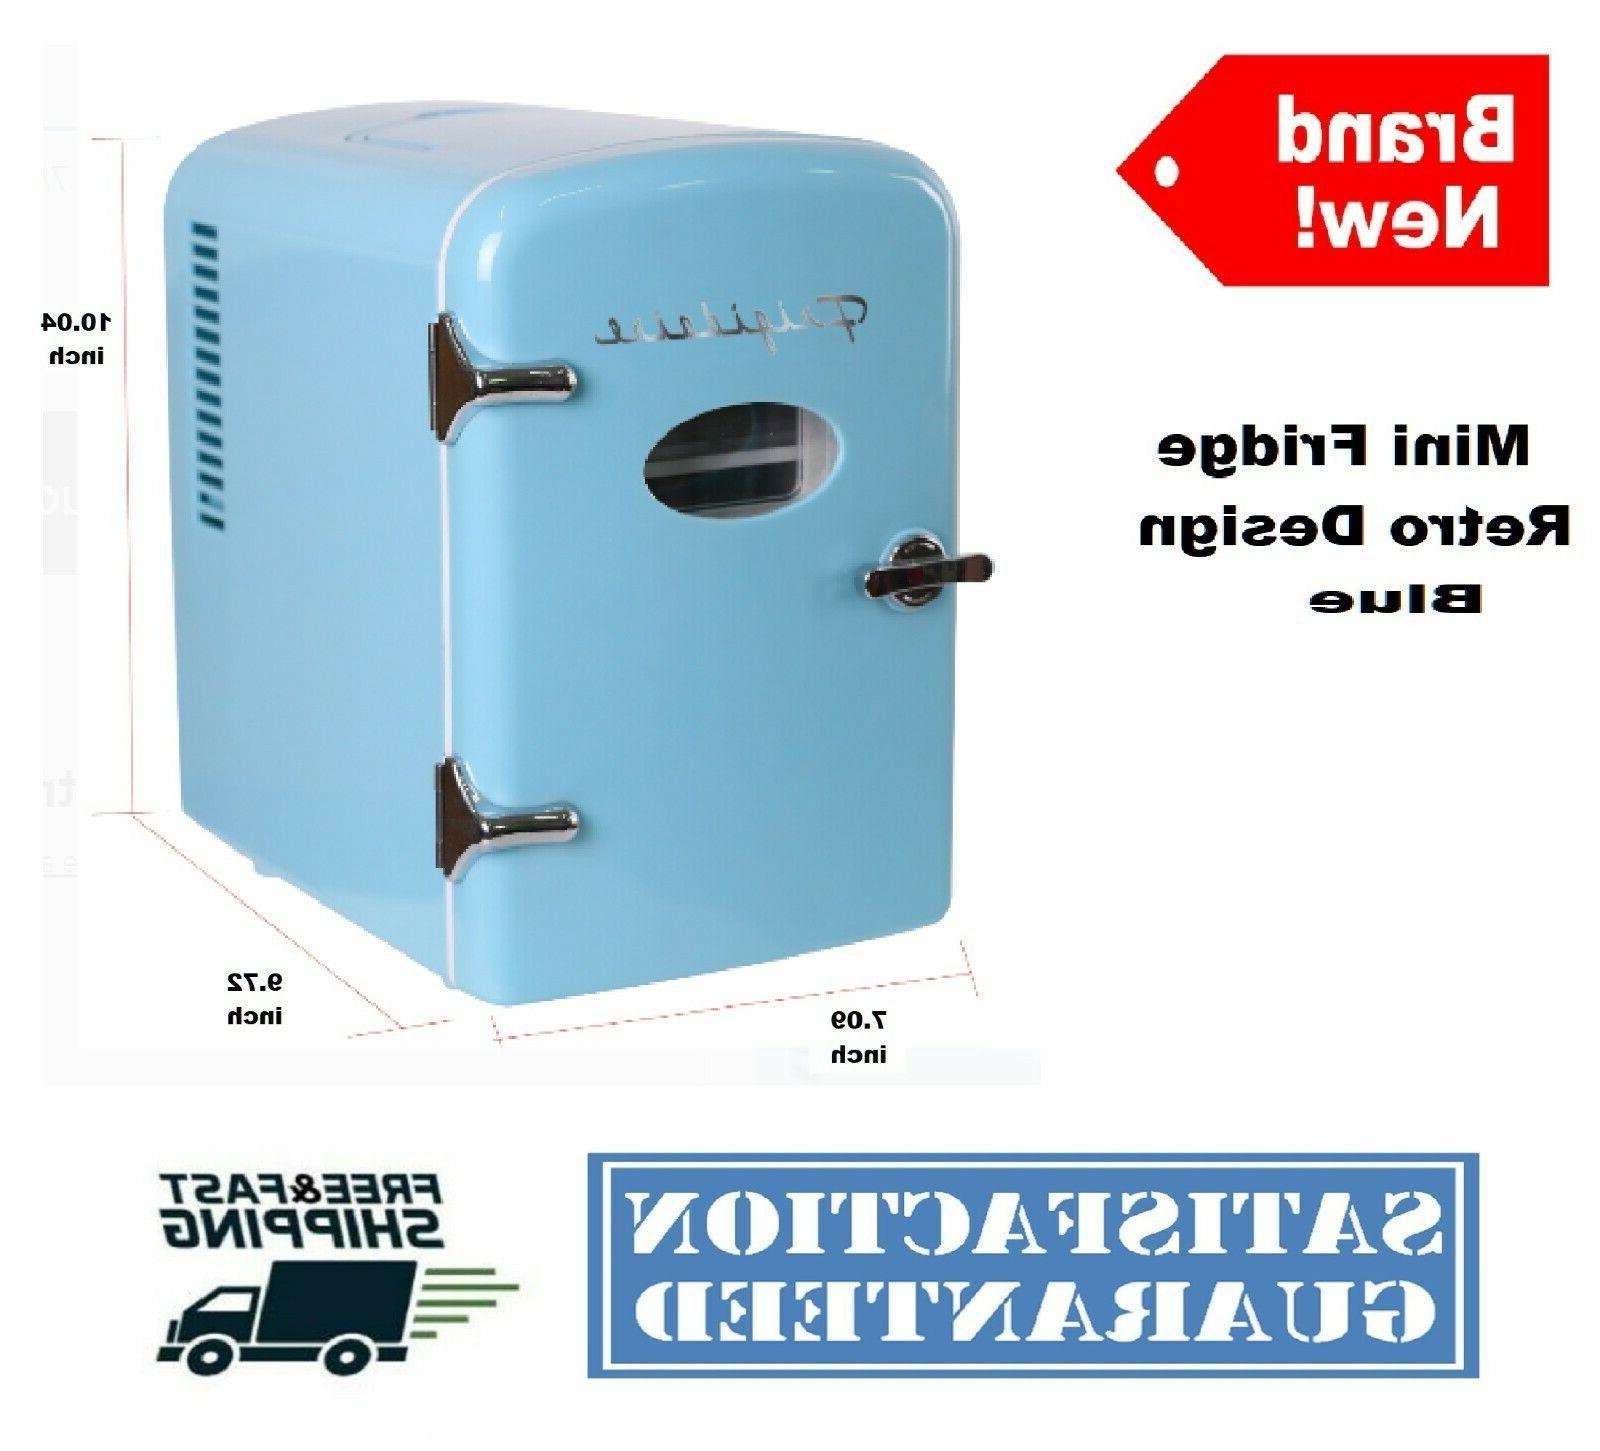 Portable Retro Fridge Cooler